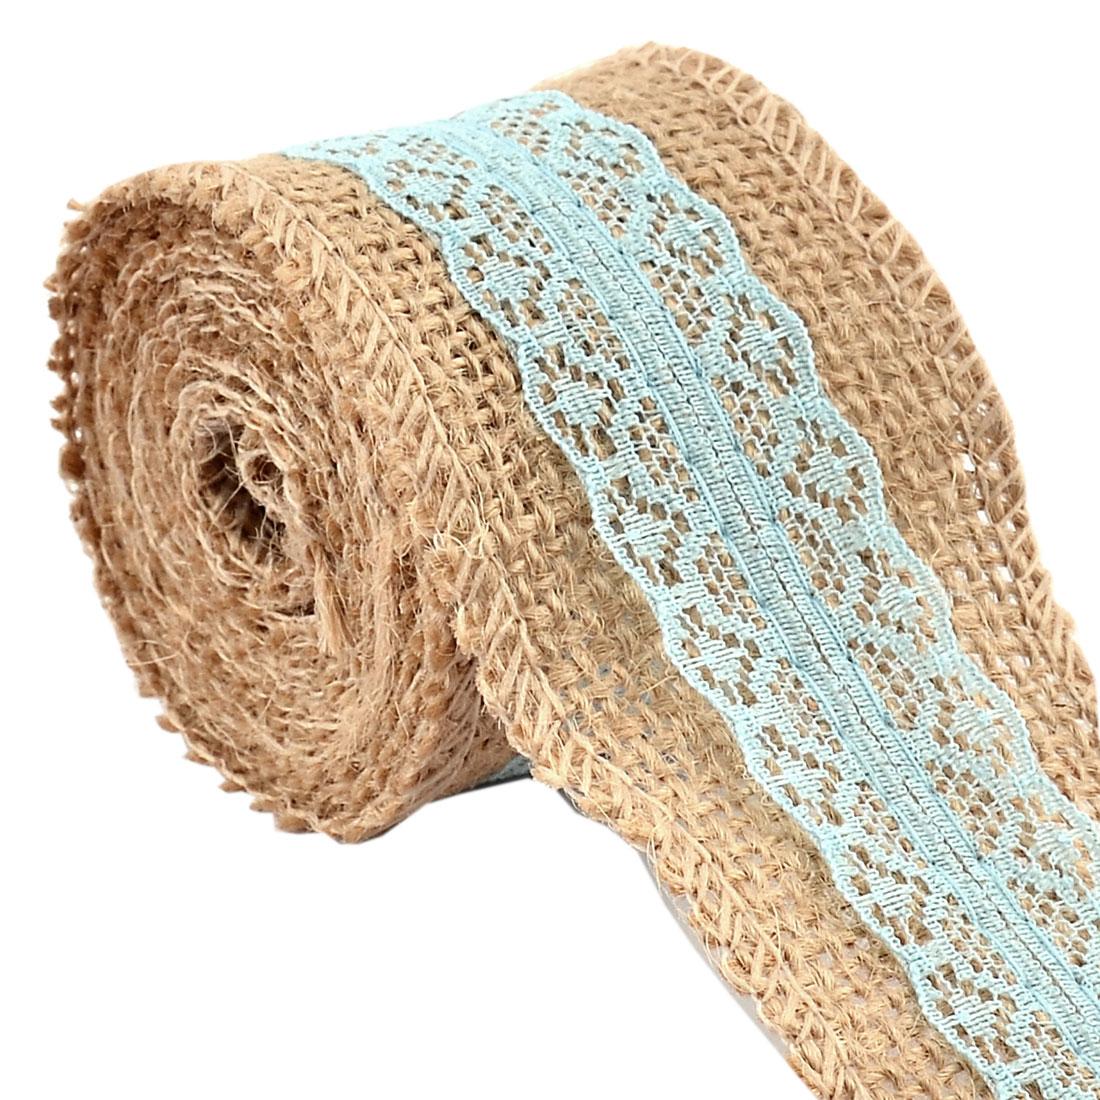 Wedding Burlap Belt Strap String Crafting Lace Trim Edge Ribbon Roll Blue 2.2 Yards